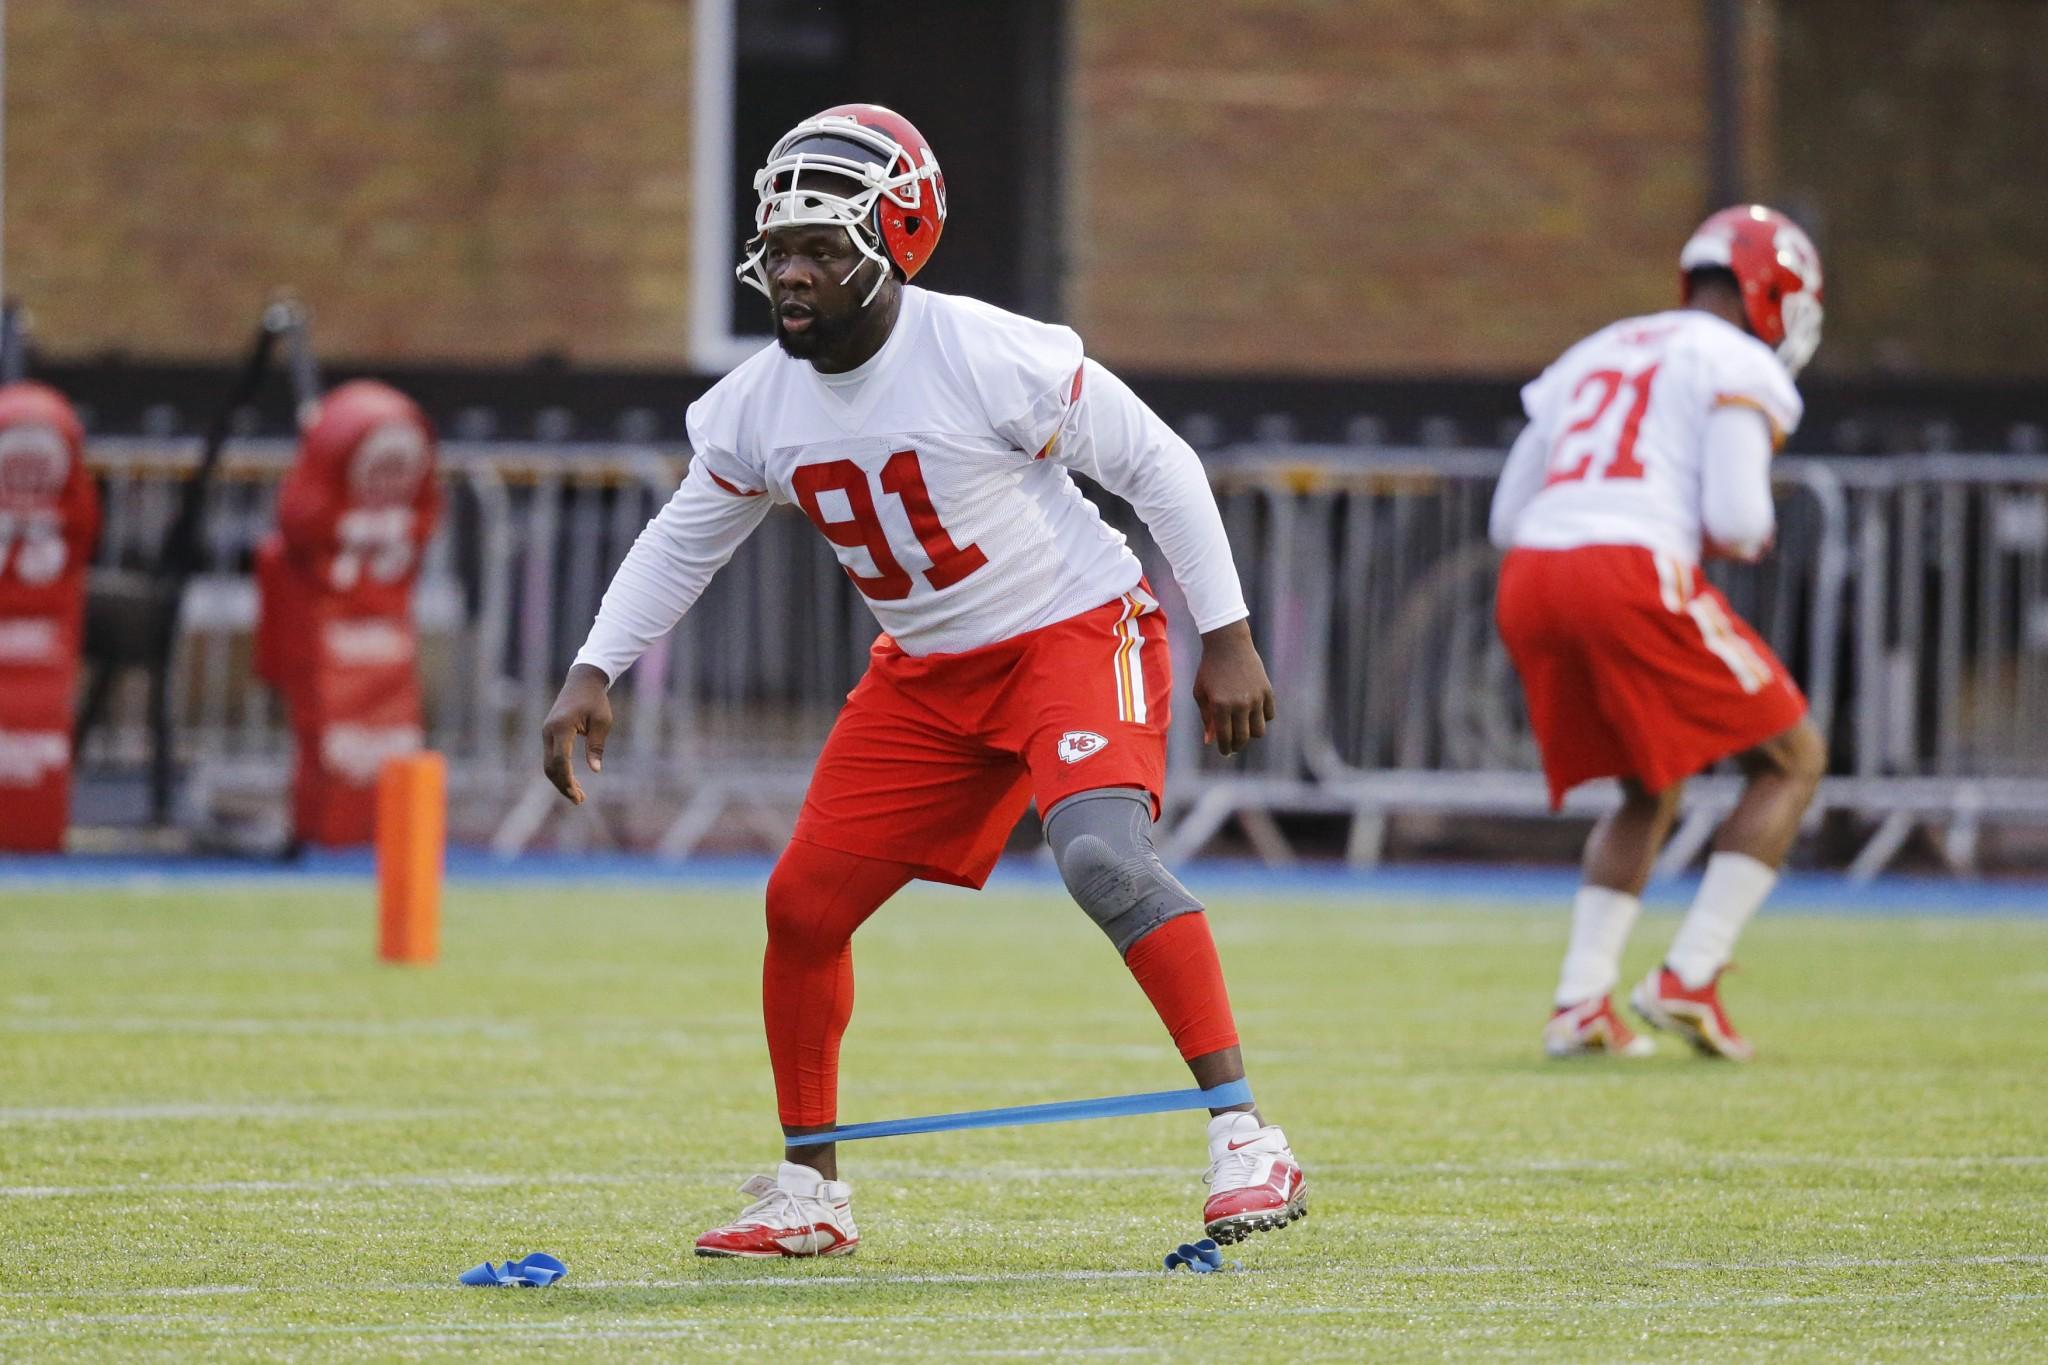 Normally quiet, Chiefs veteran Tamba Hali wondered if his team still needs him in a Saturday Twitter outburst. (AP)